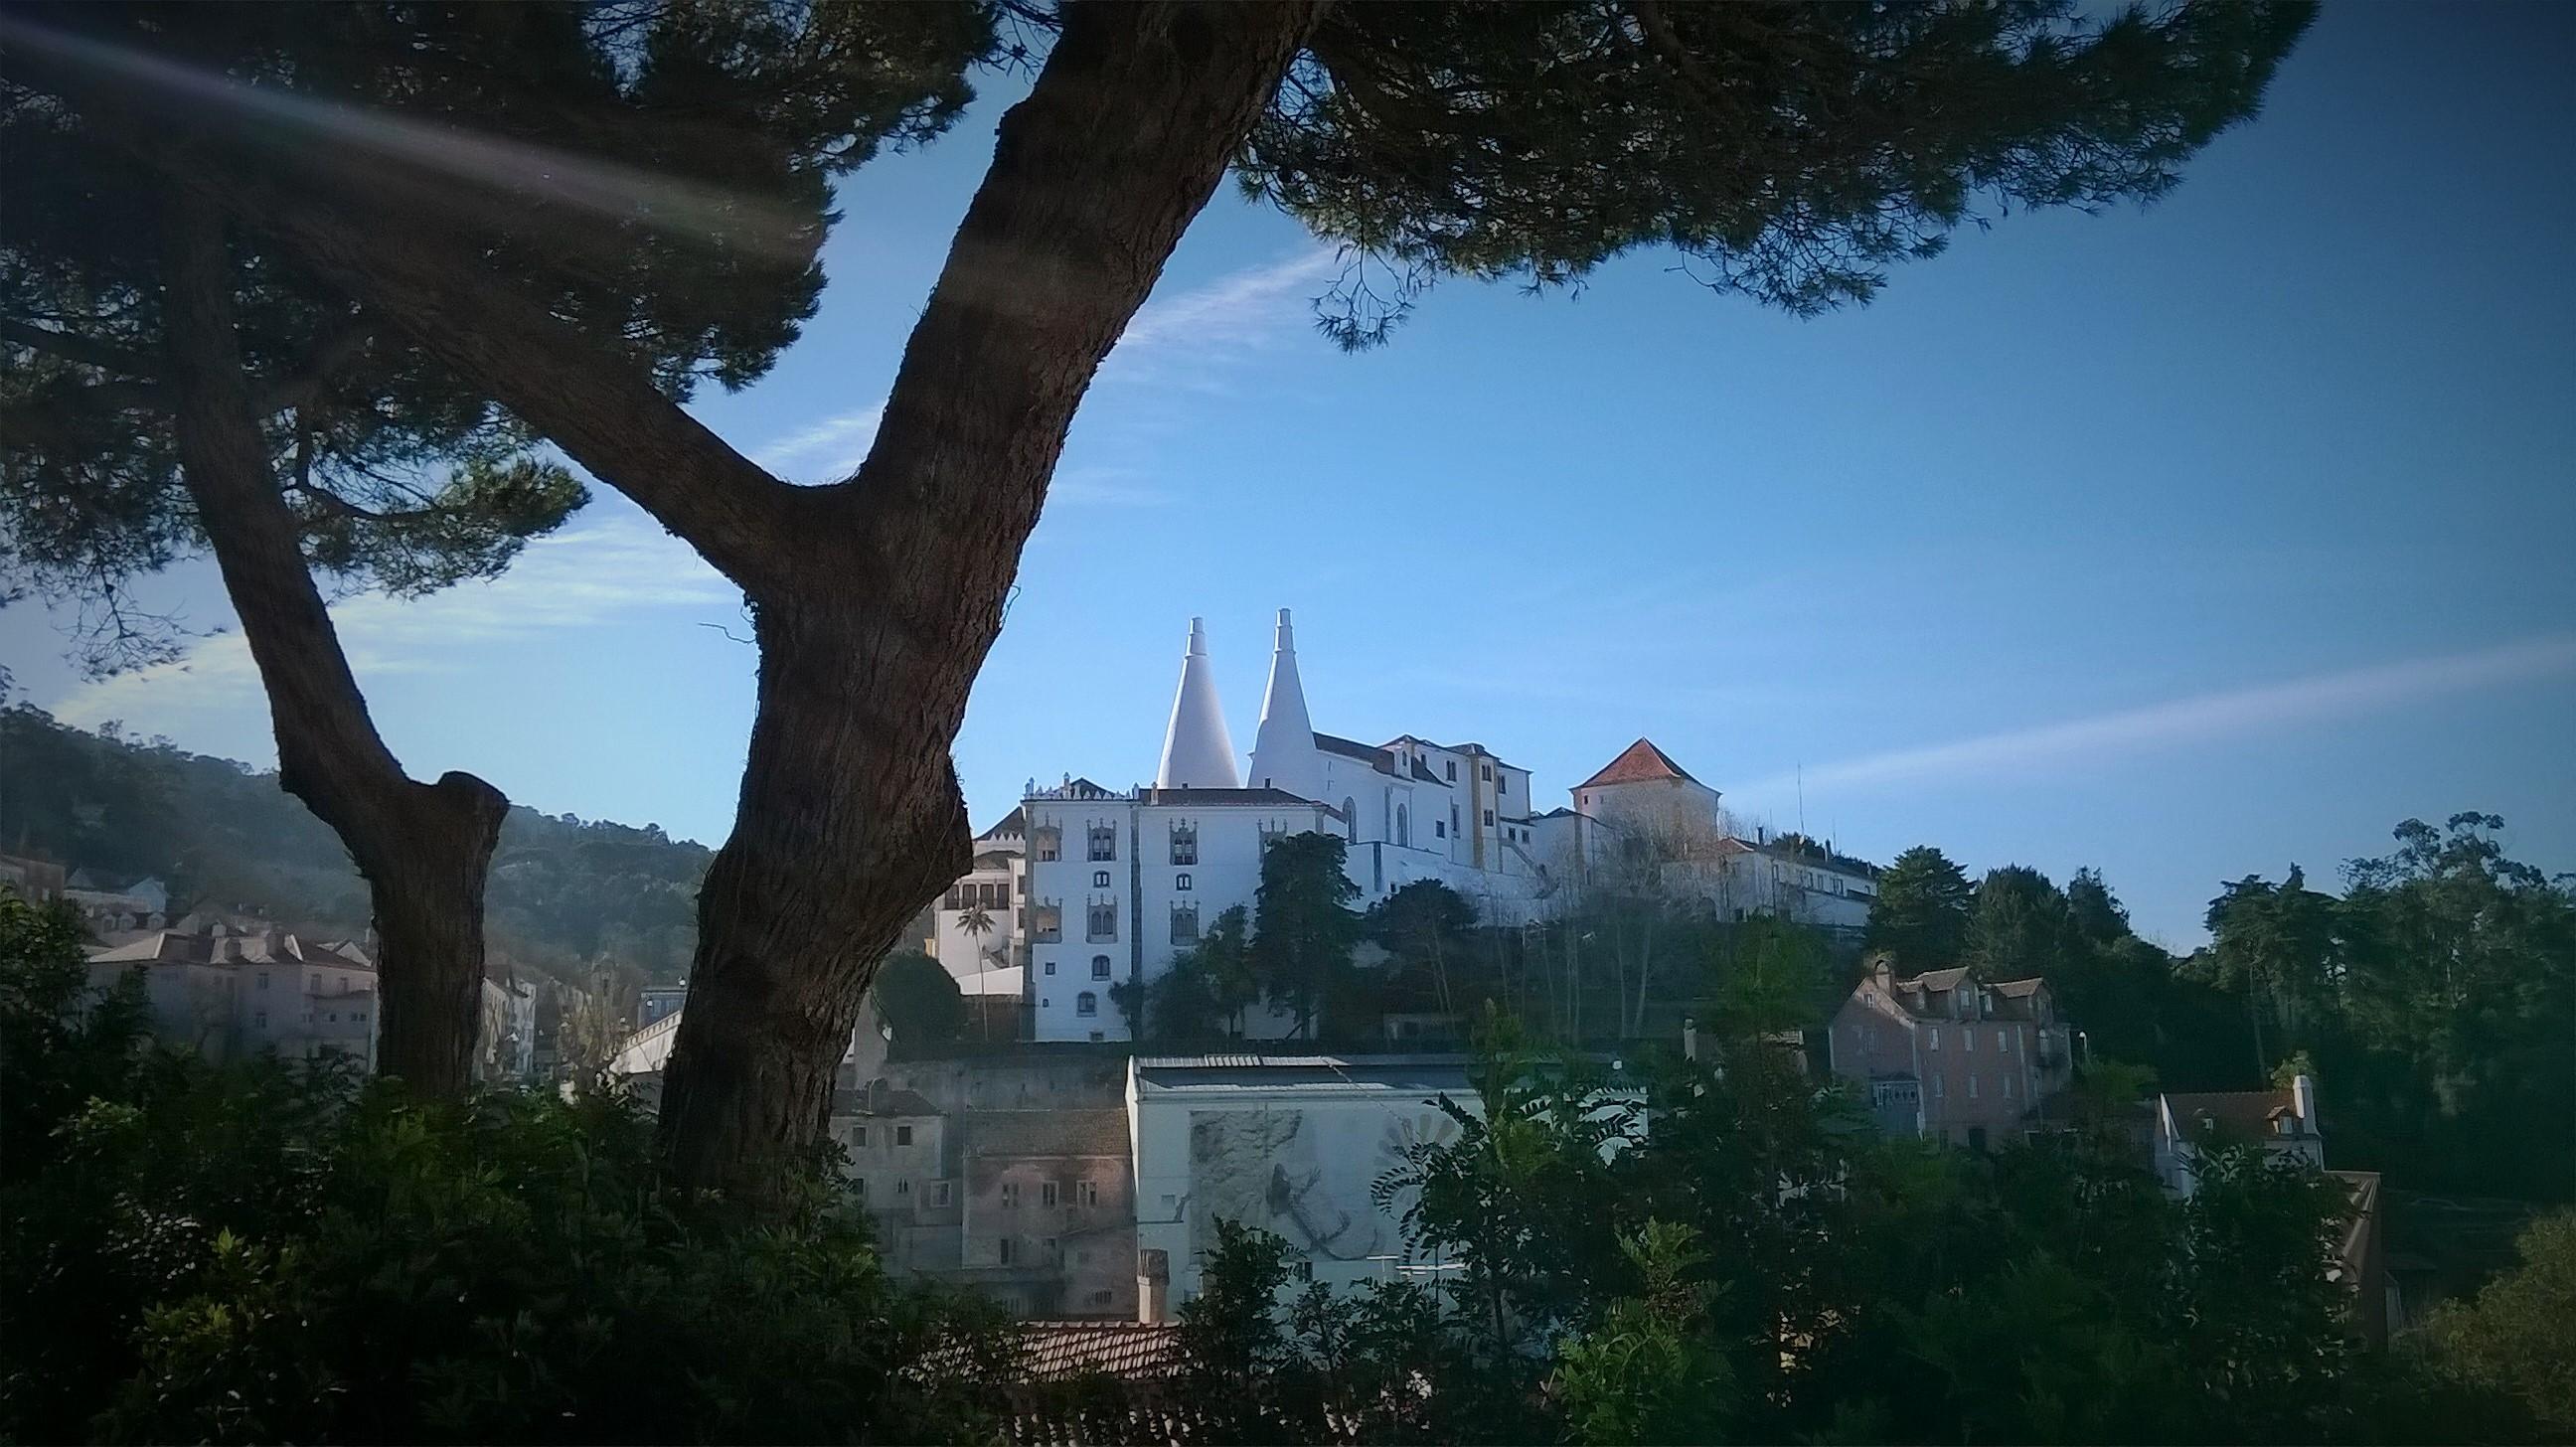 VI Międzynarodowe Seminarium Baśnioterapii i Storytellingu - Sintra 2021